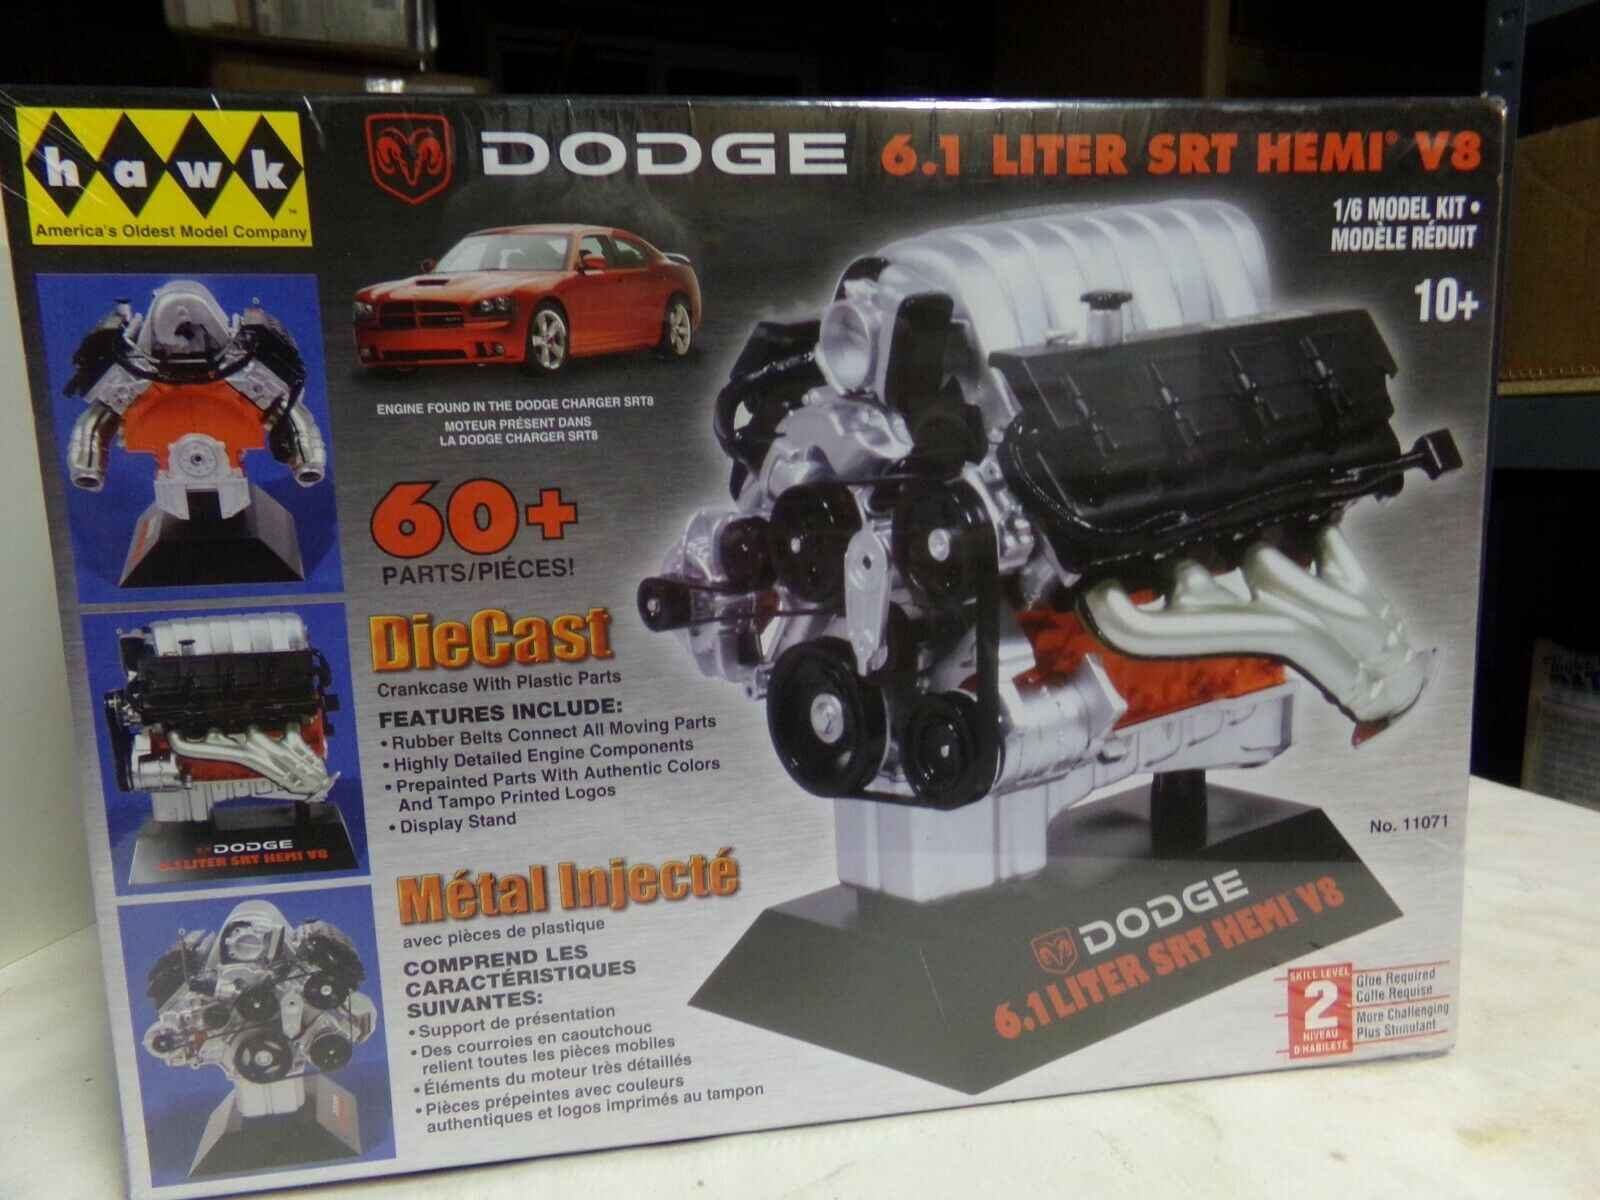 DODGE 1 6 SCALE 6.1SRT HEMI MOTOR KIT